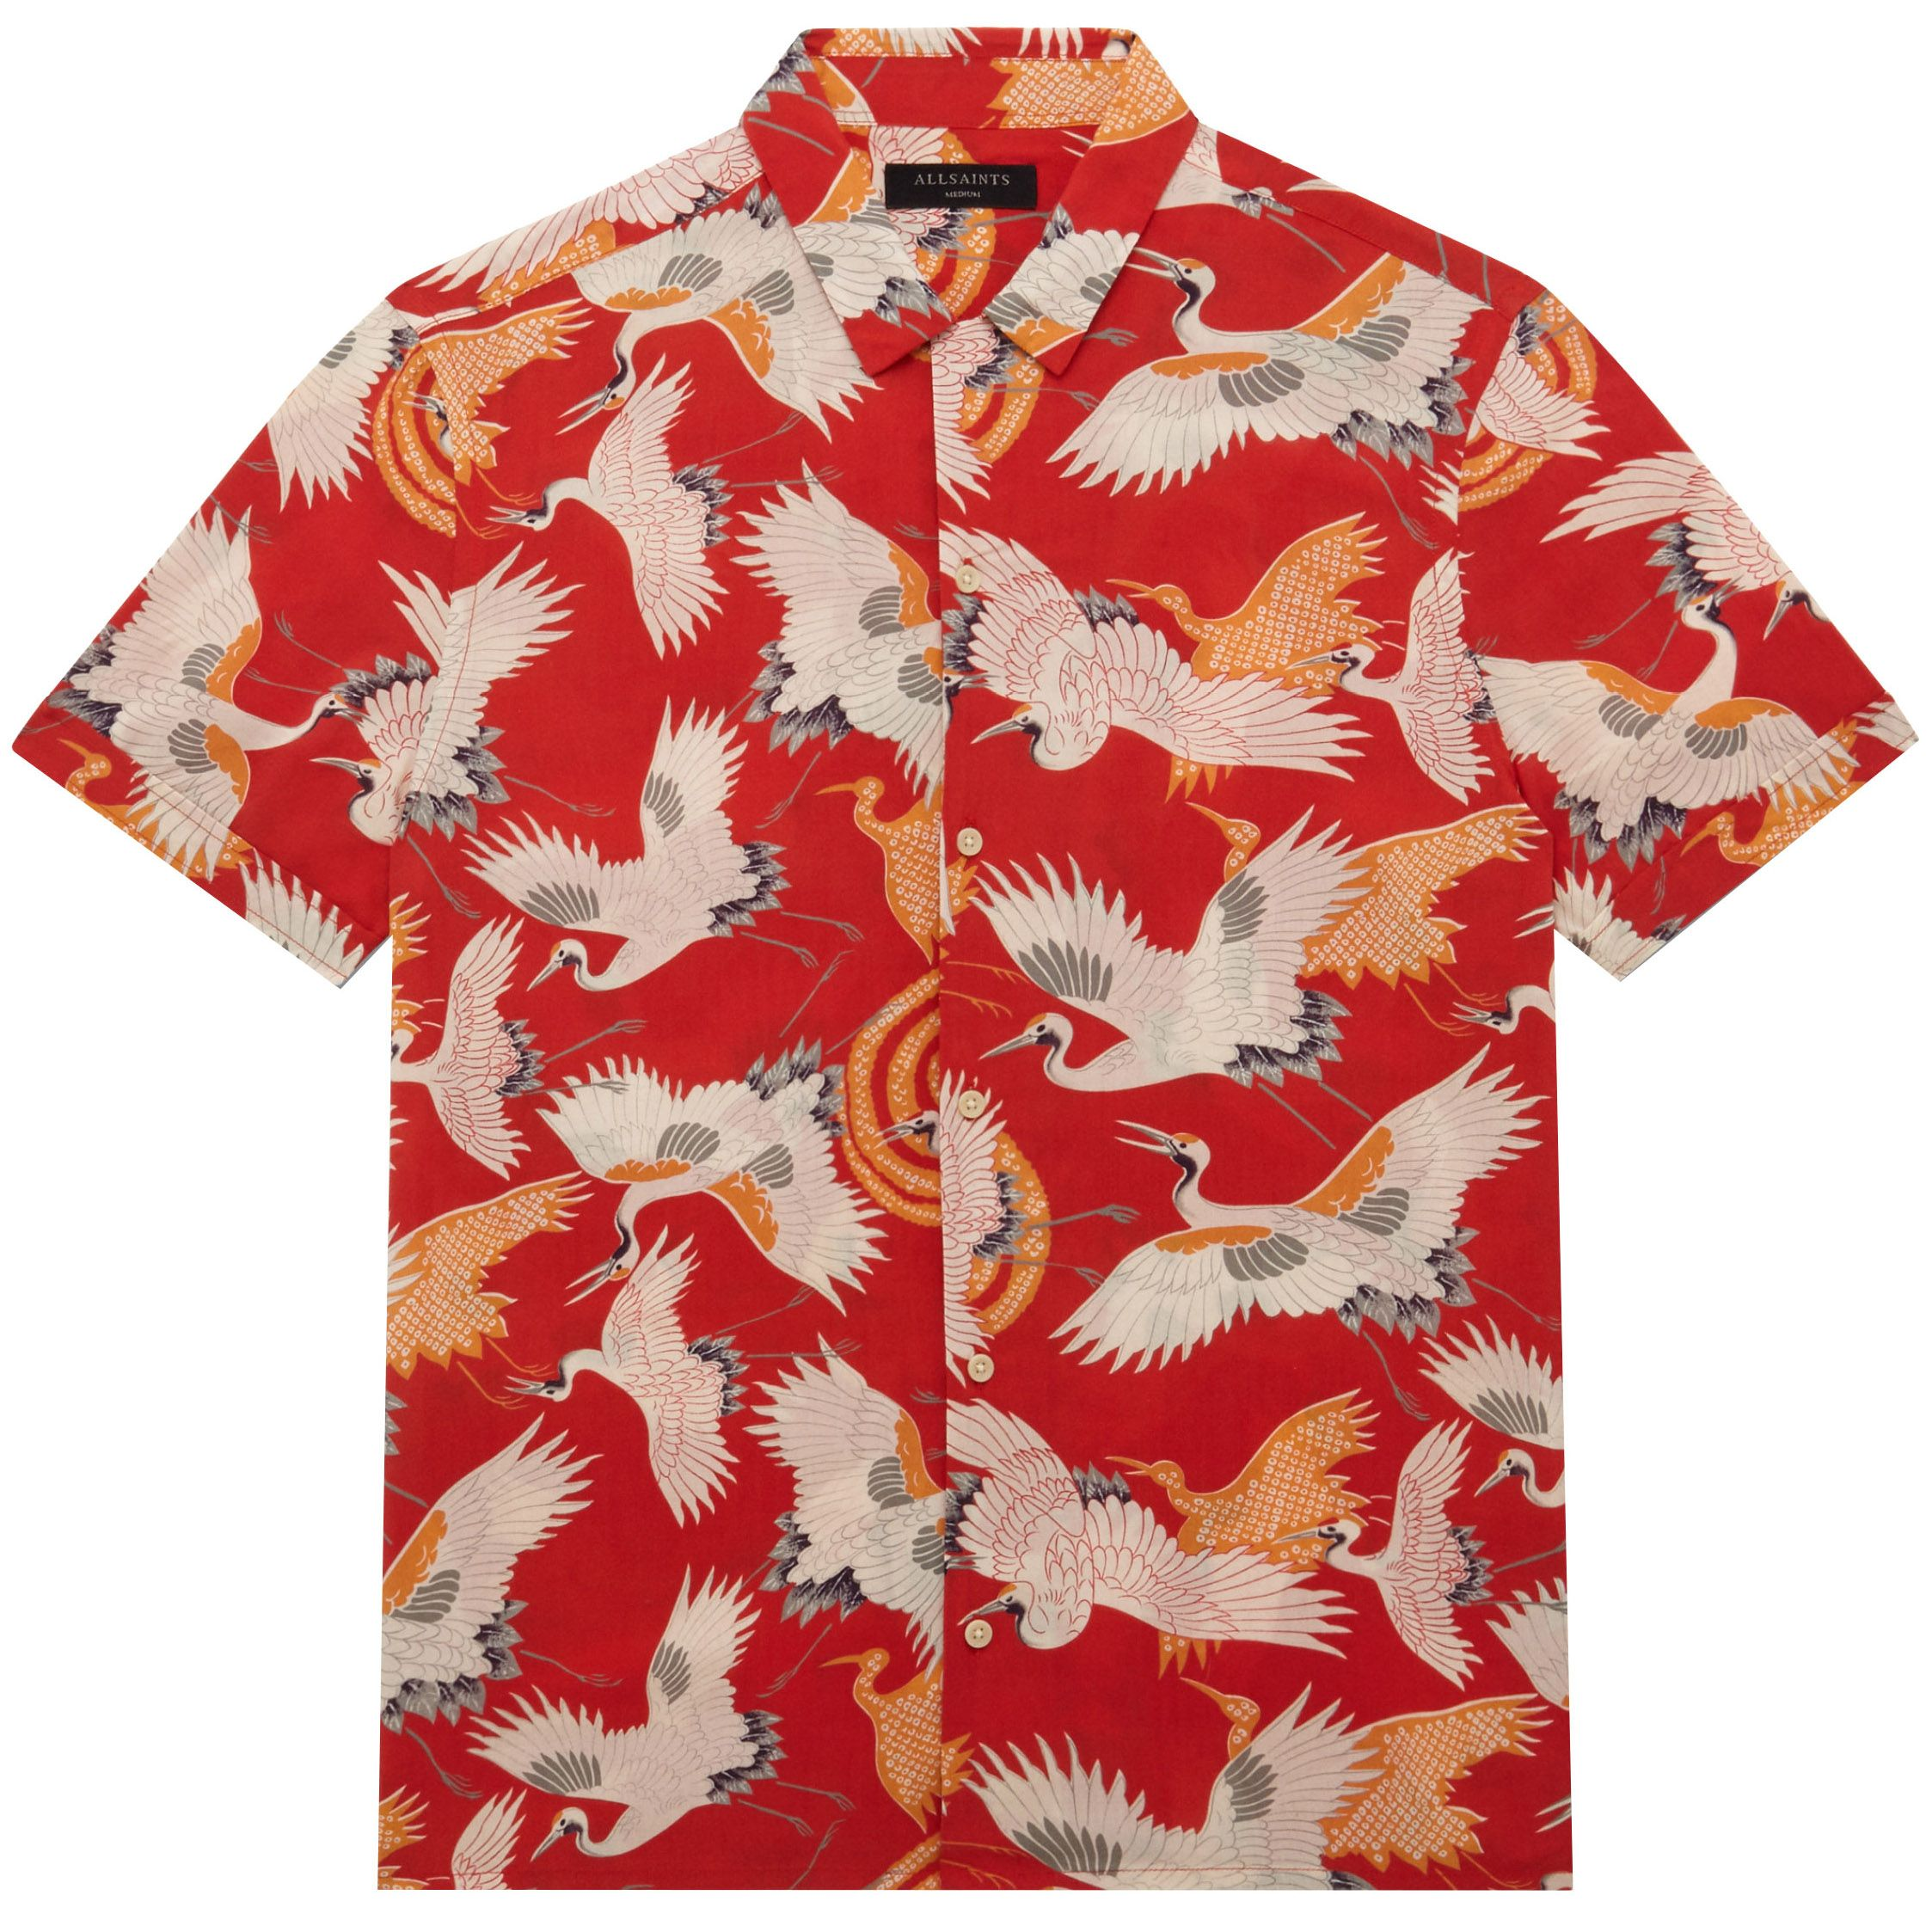 d49e75ca1 Hawaiian Shirts To Buy | Top Mode Depot